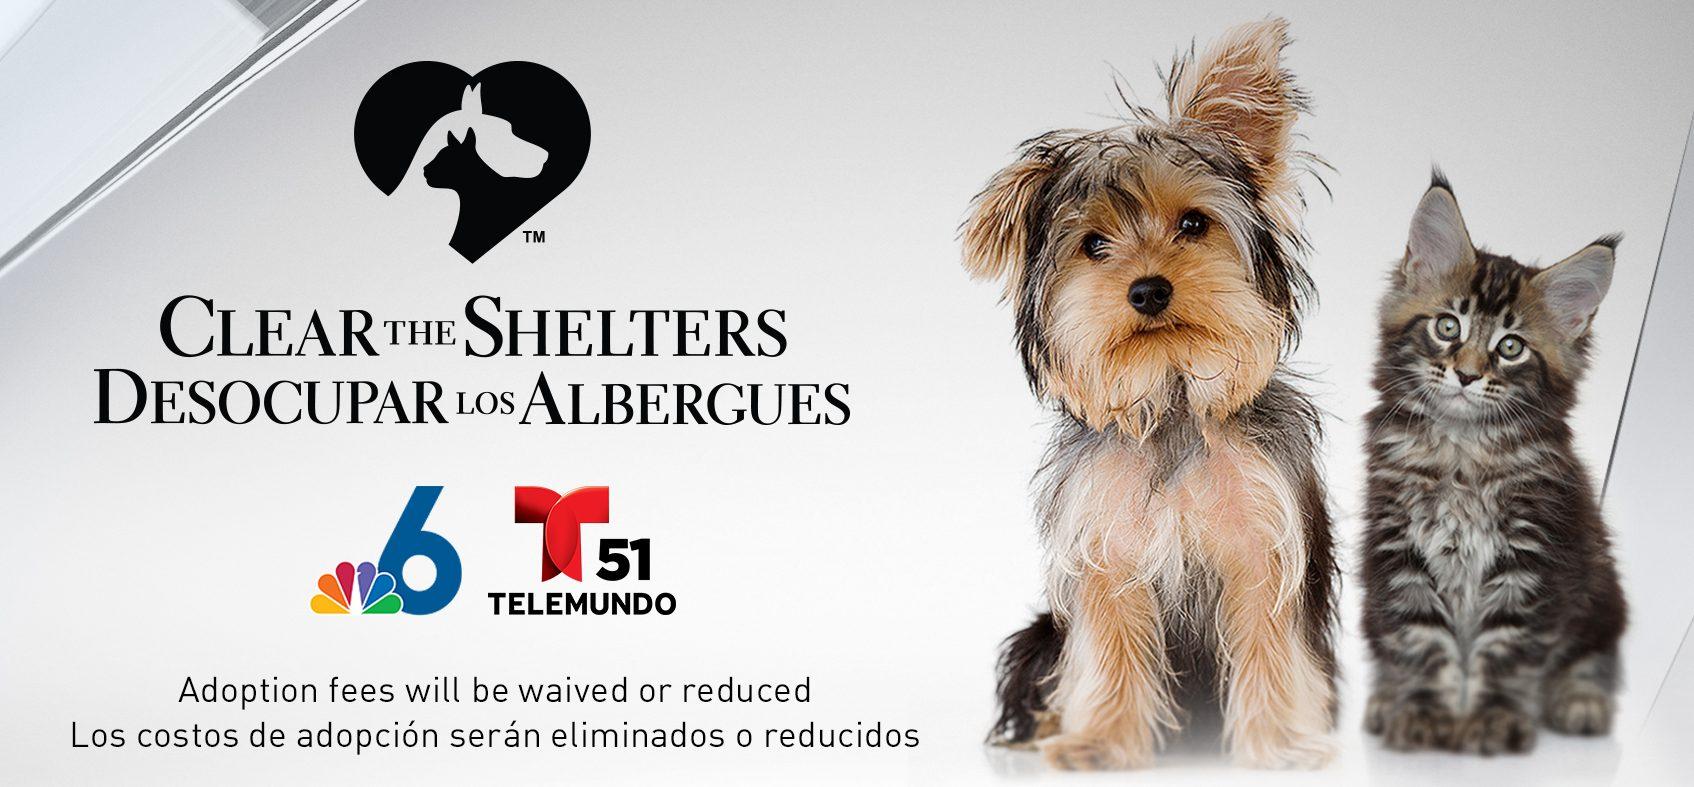 CTS_Flyer_Shelters_DU